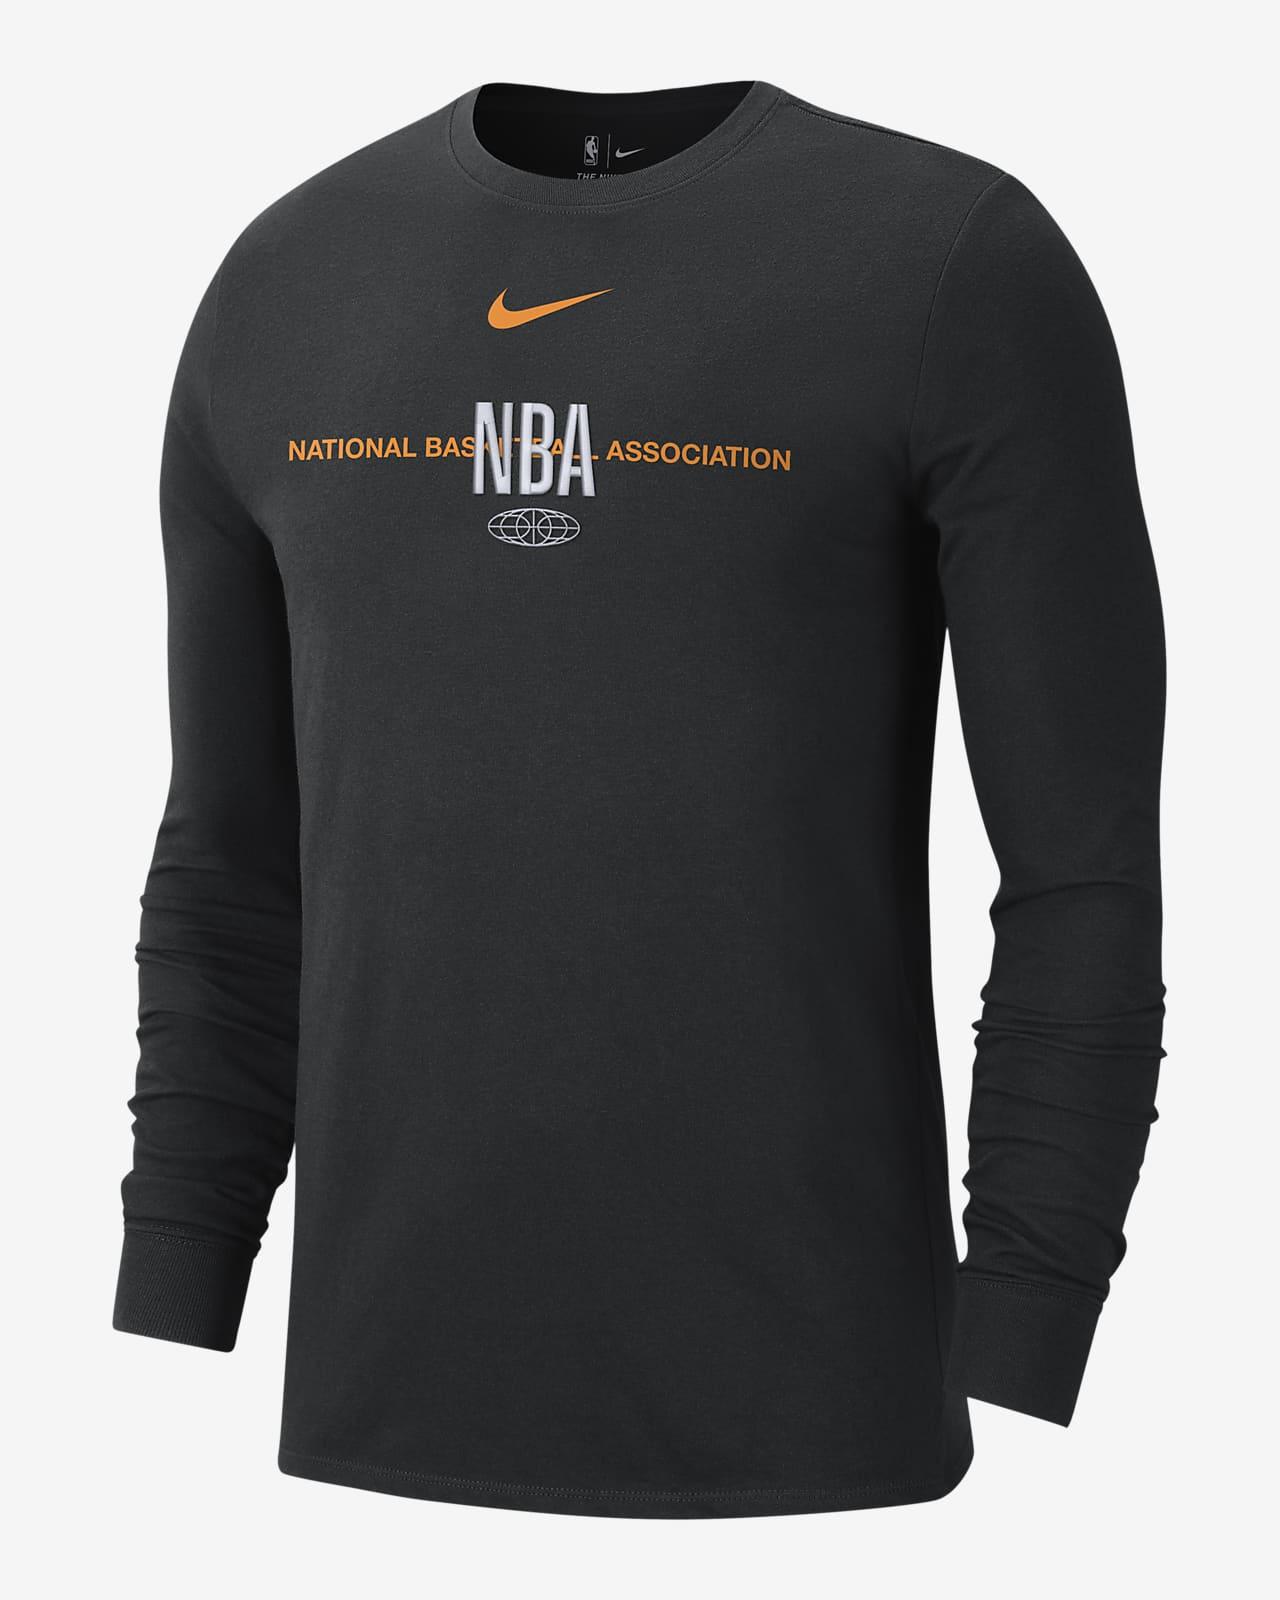 Team 31 Courtside Men's Nike NBA Long-Sleeve T-Shirt